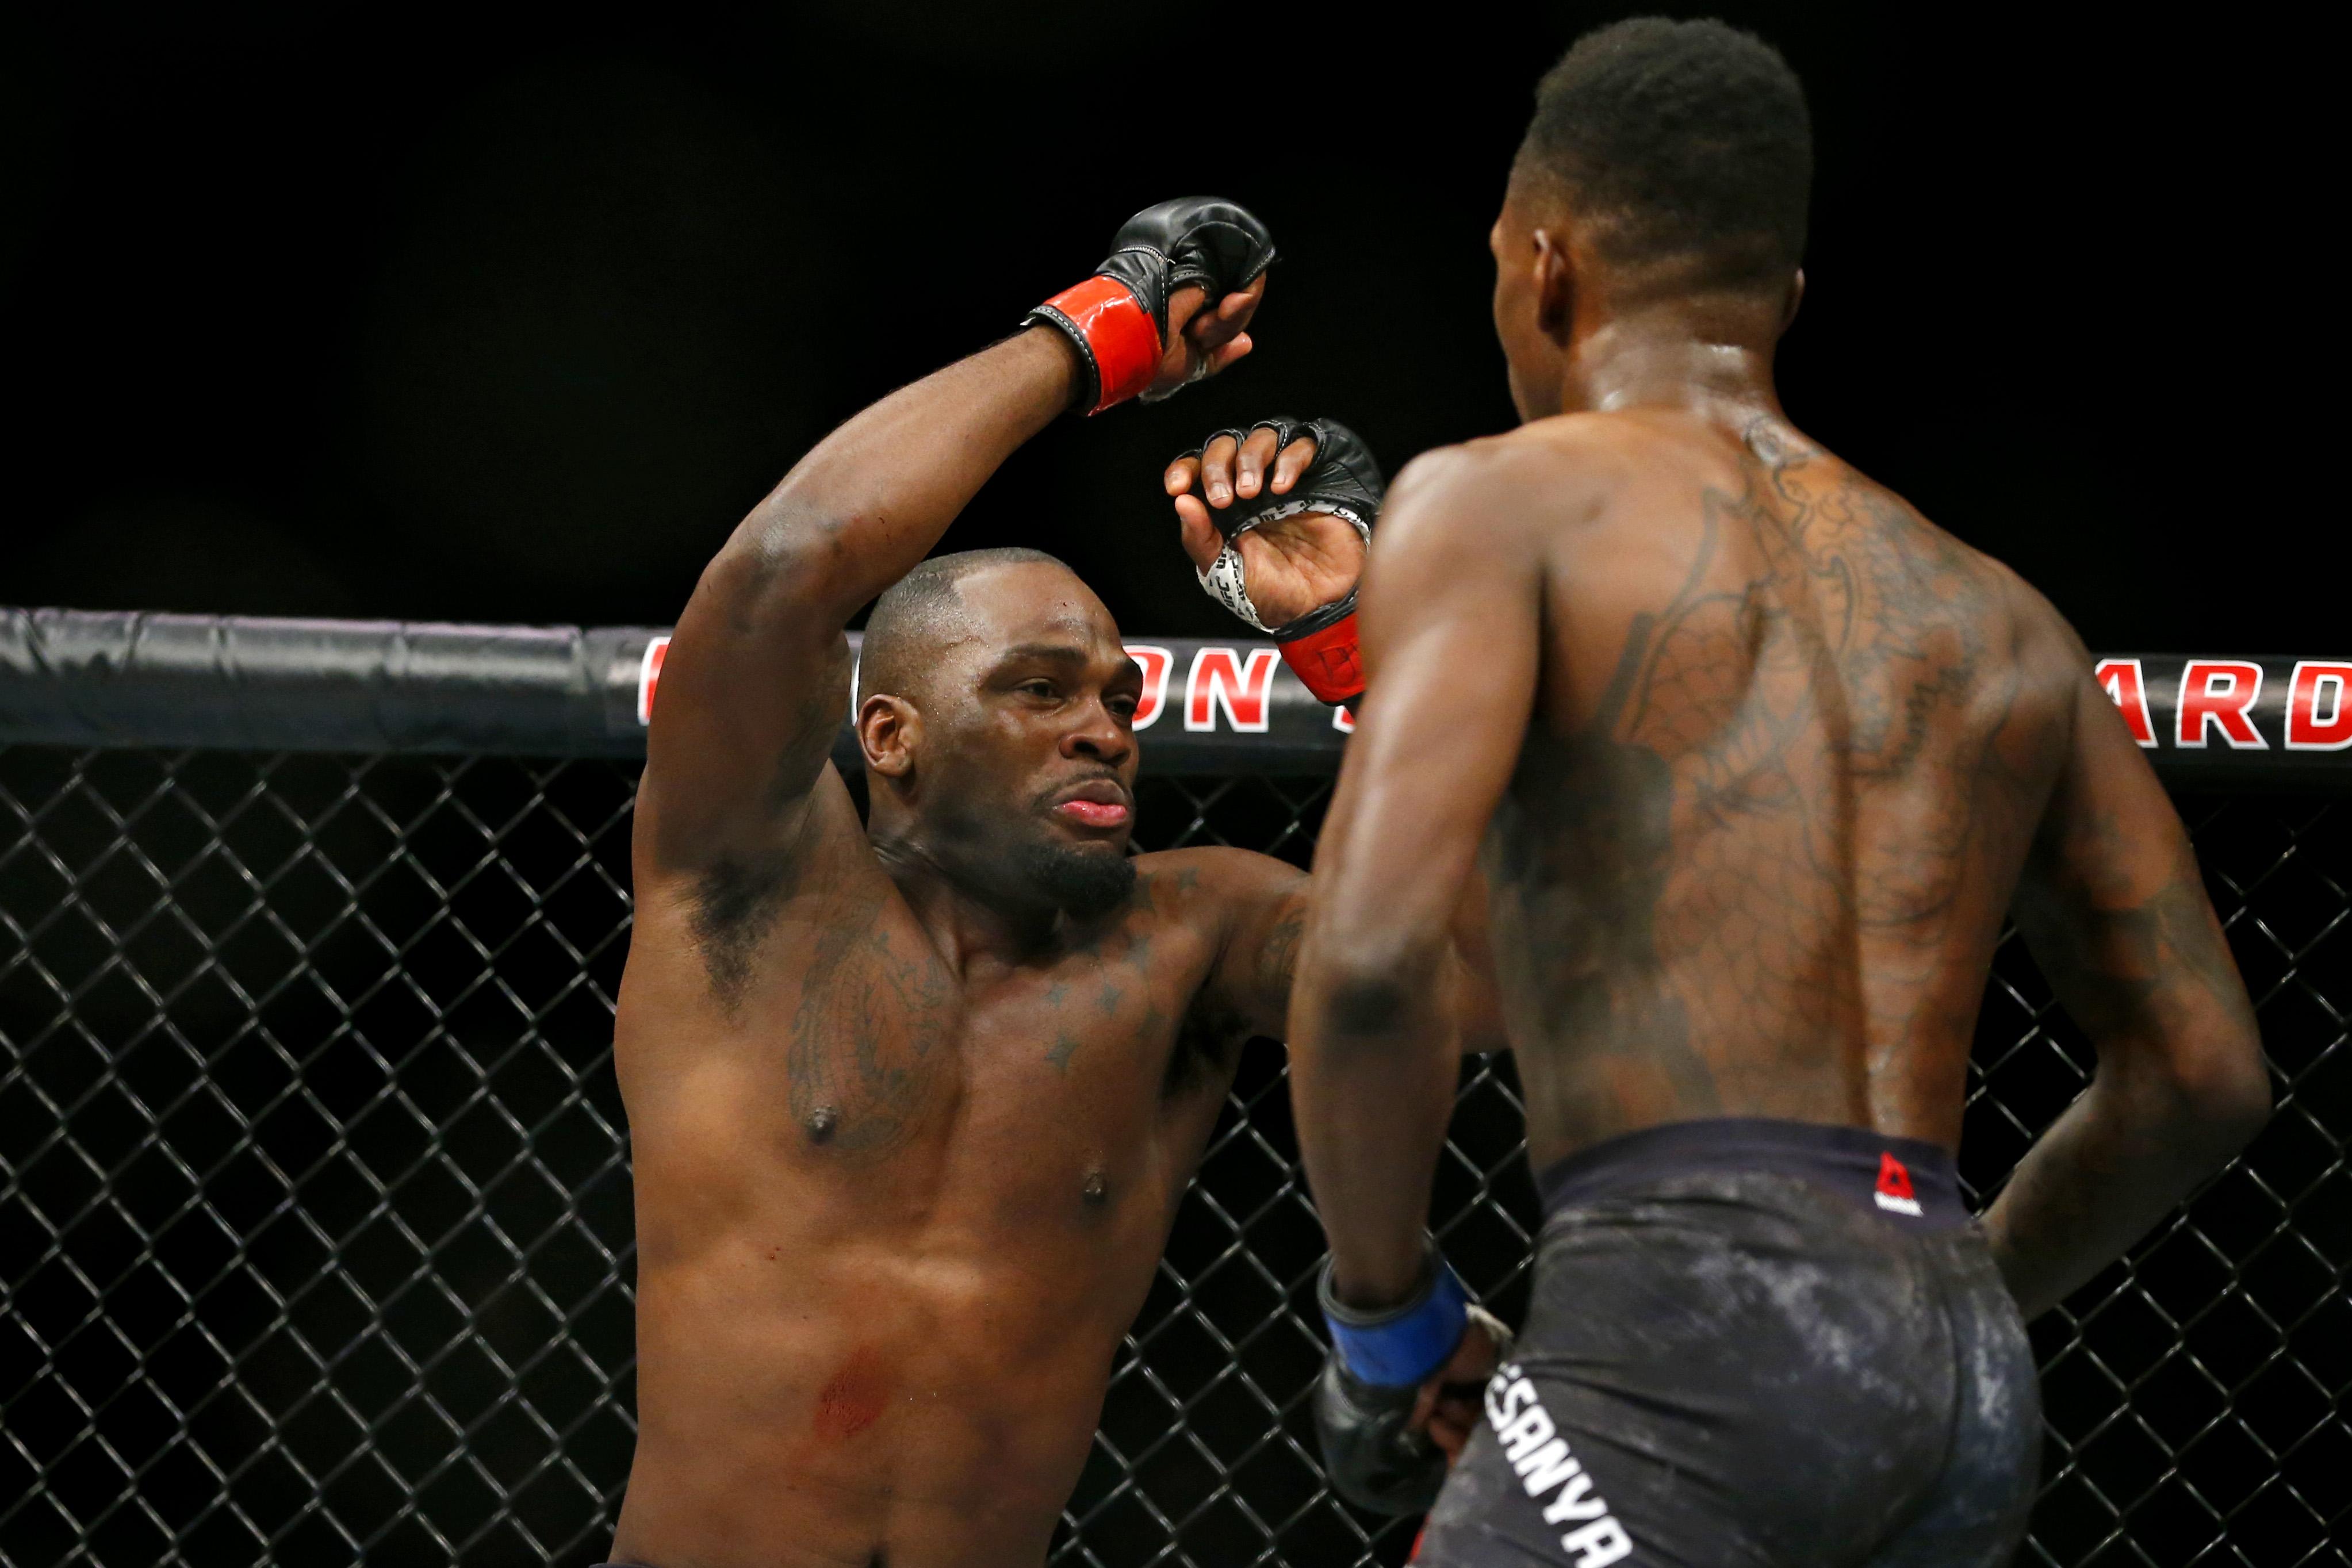 MMA: UFC 230 - Brunson vs Adesanya